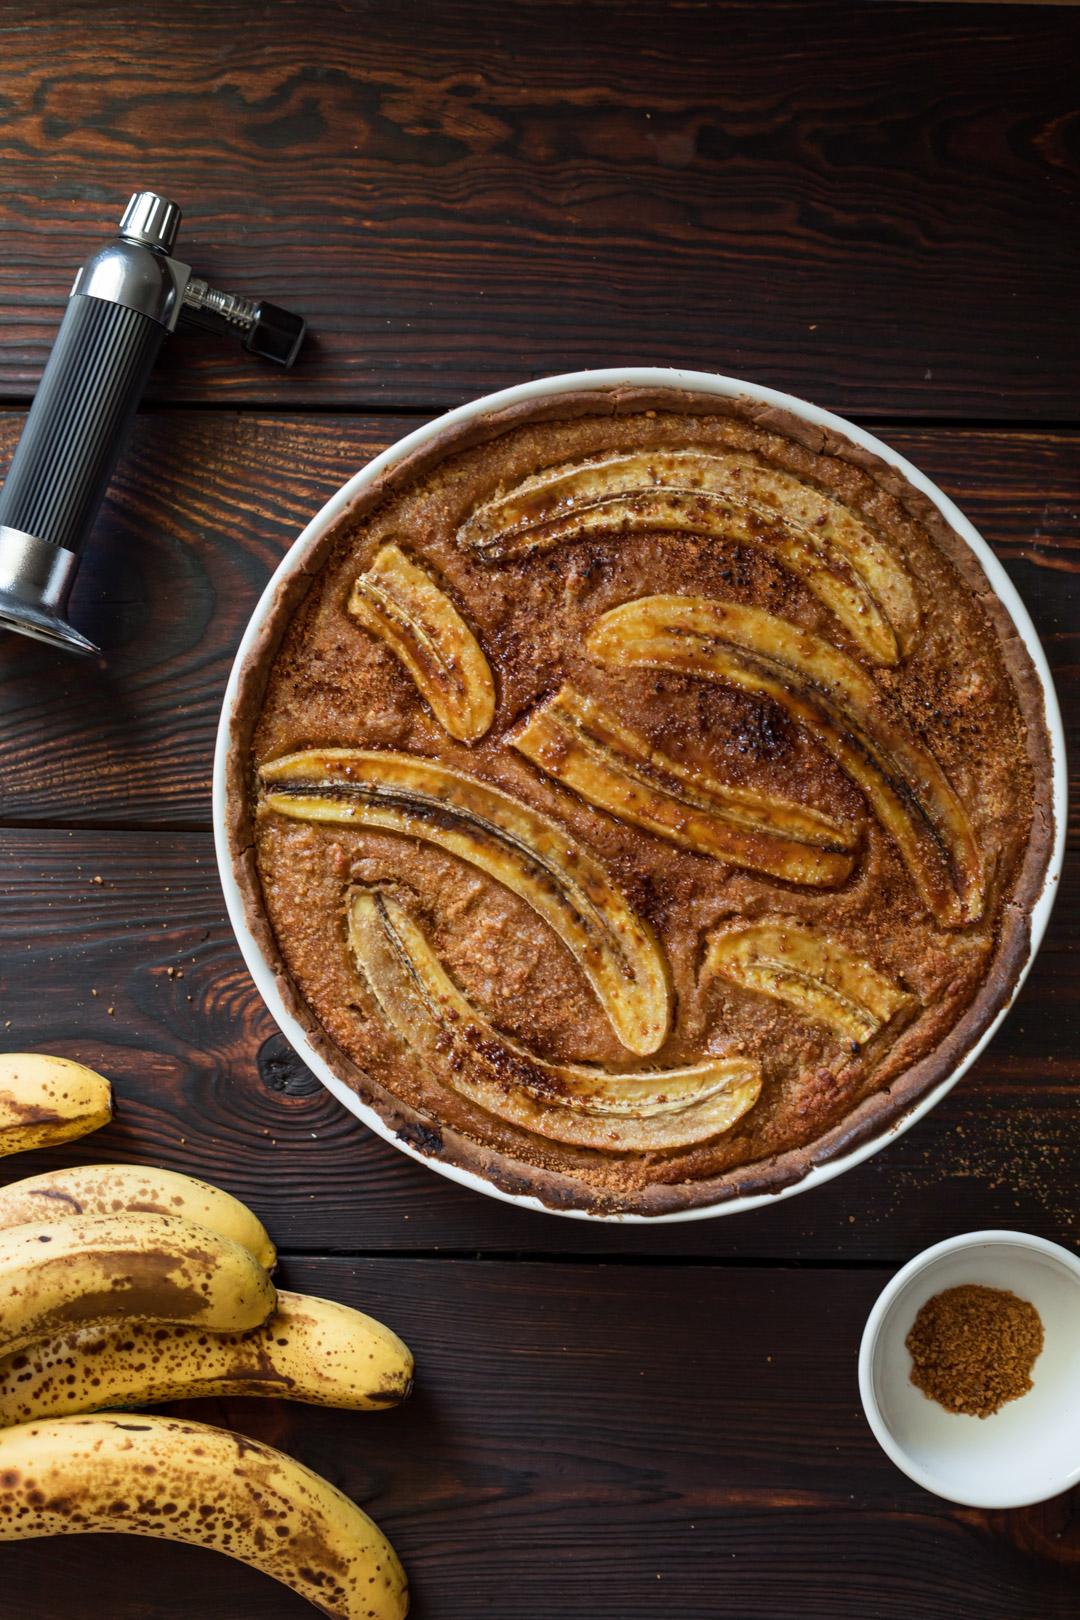 Vegan Gluten-free Caramelized Banana Almond Tart